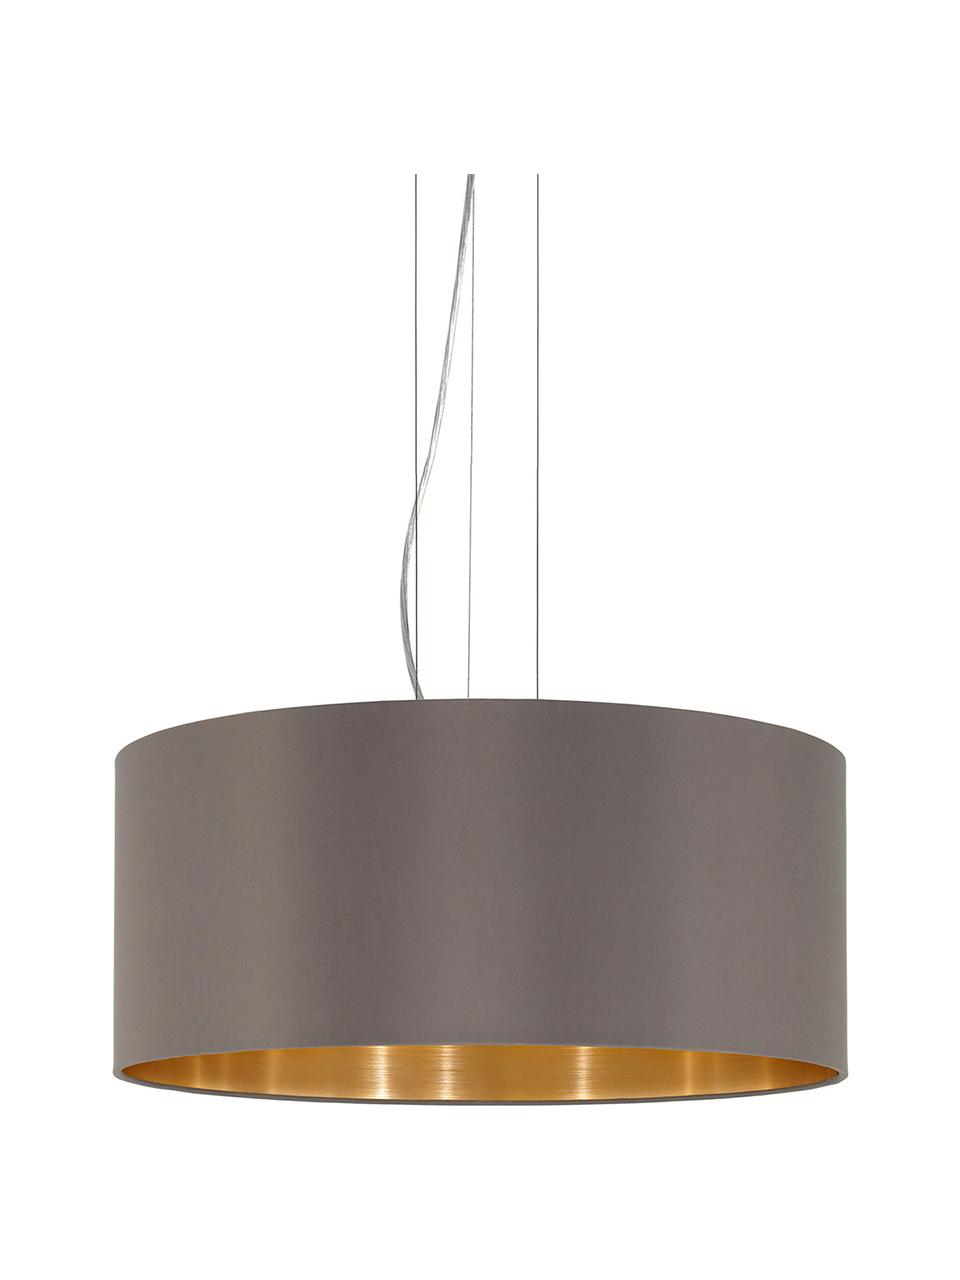 Lampada a sospensione Jamie, Baldacchino: metallo nichelato, Argentato, grigio-beige, Ø 53 x Alt. 24 cm